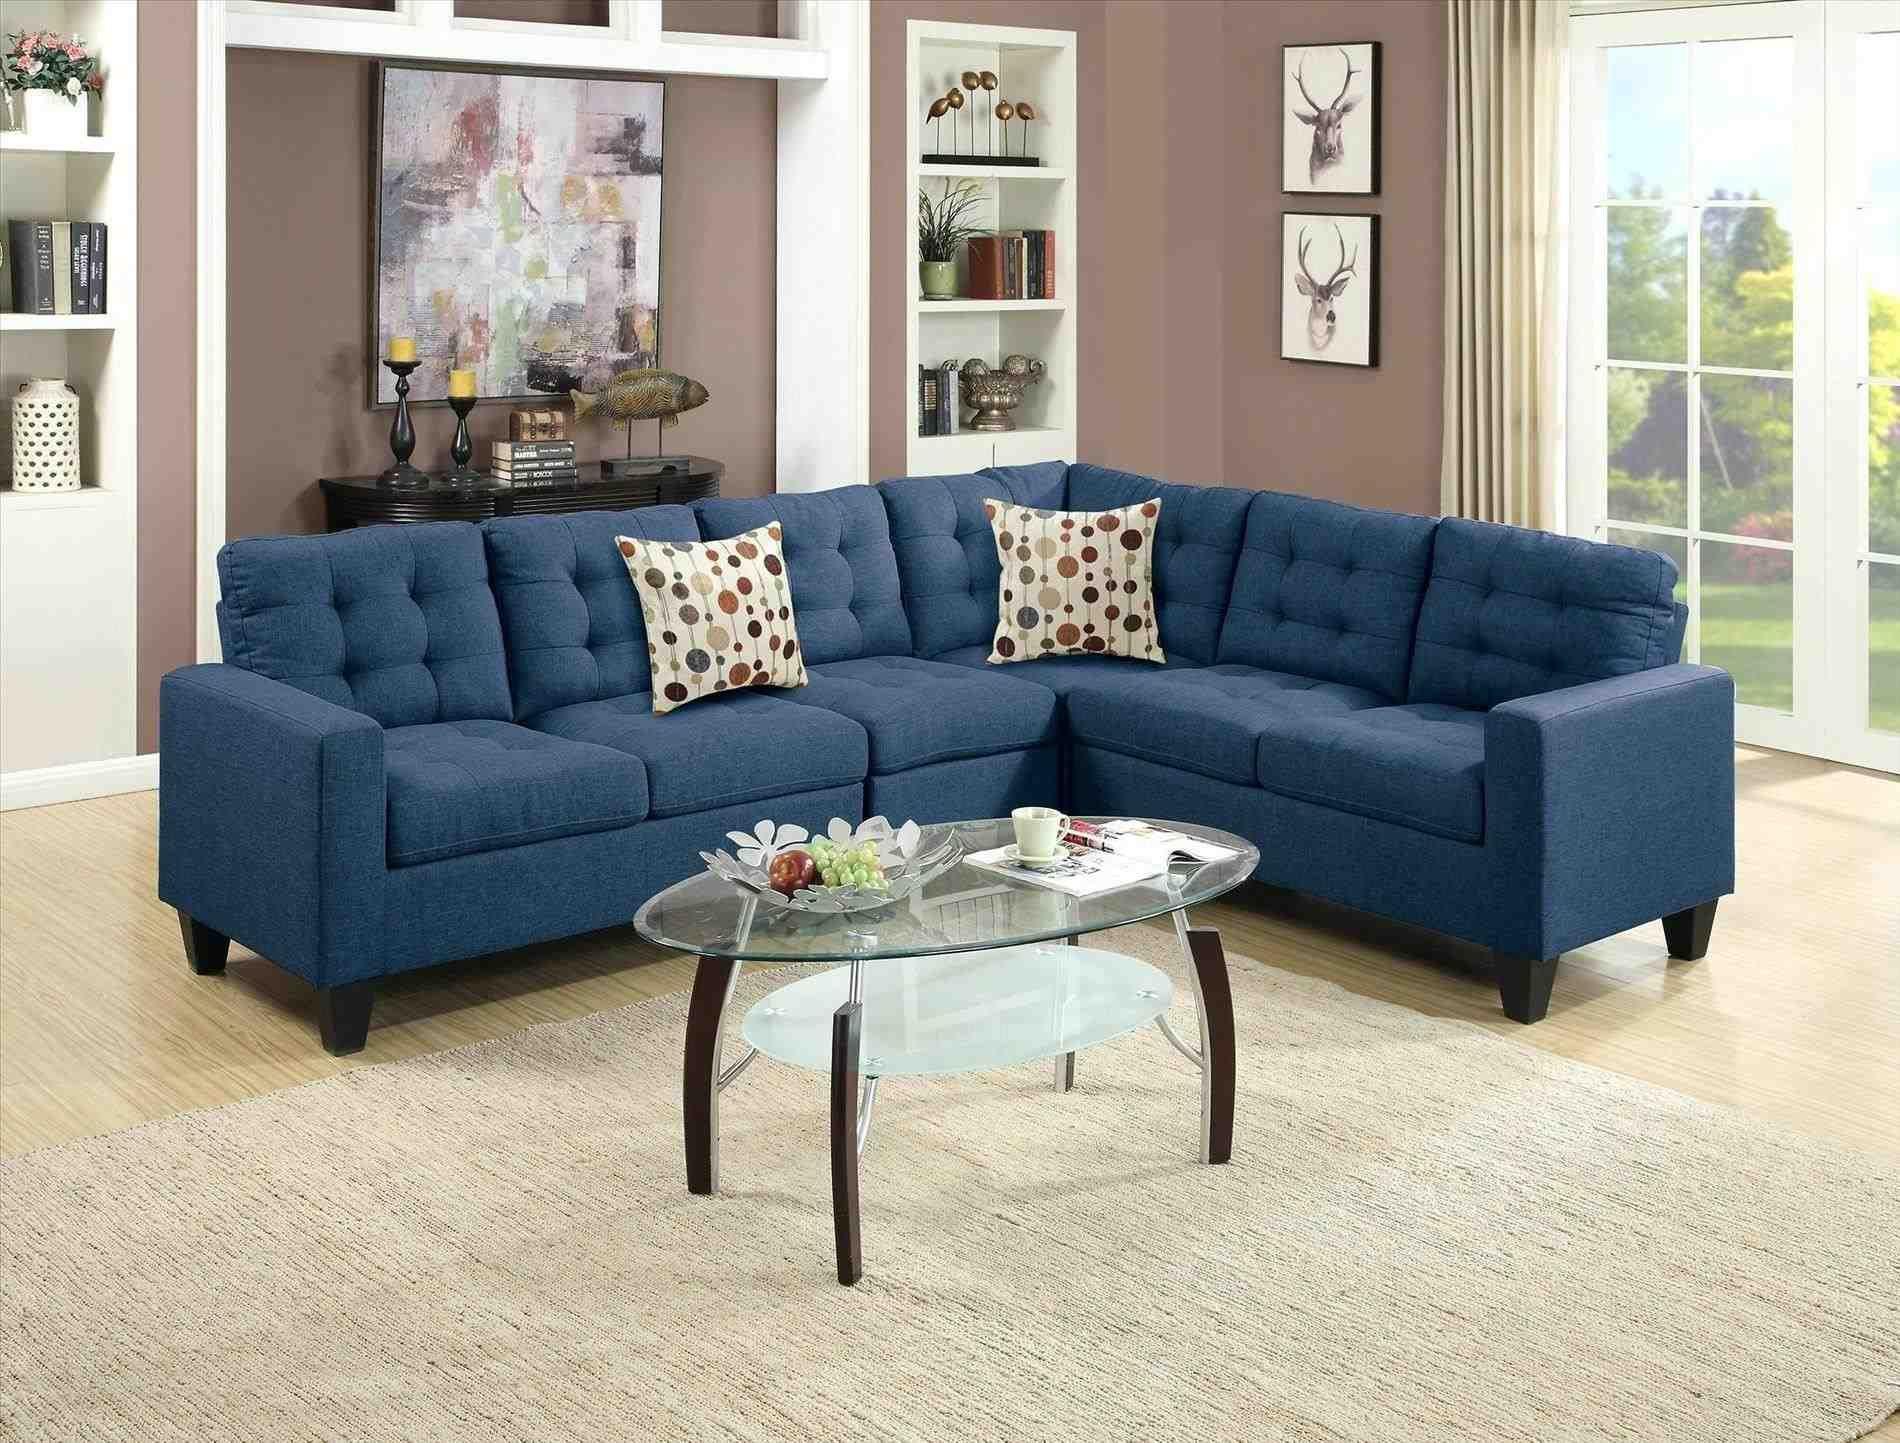 Cheap Recliners Calgary Modular Sectional Sofa Fabric Sectional Sofas Sectional Sofa Couch